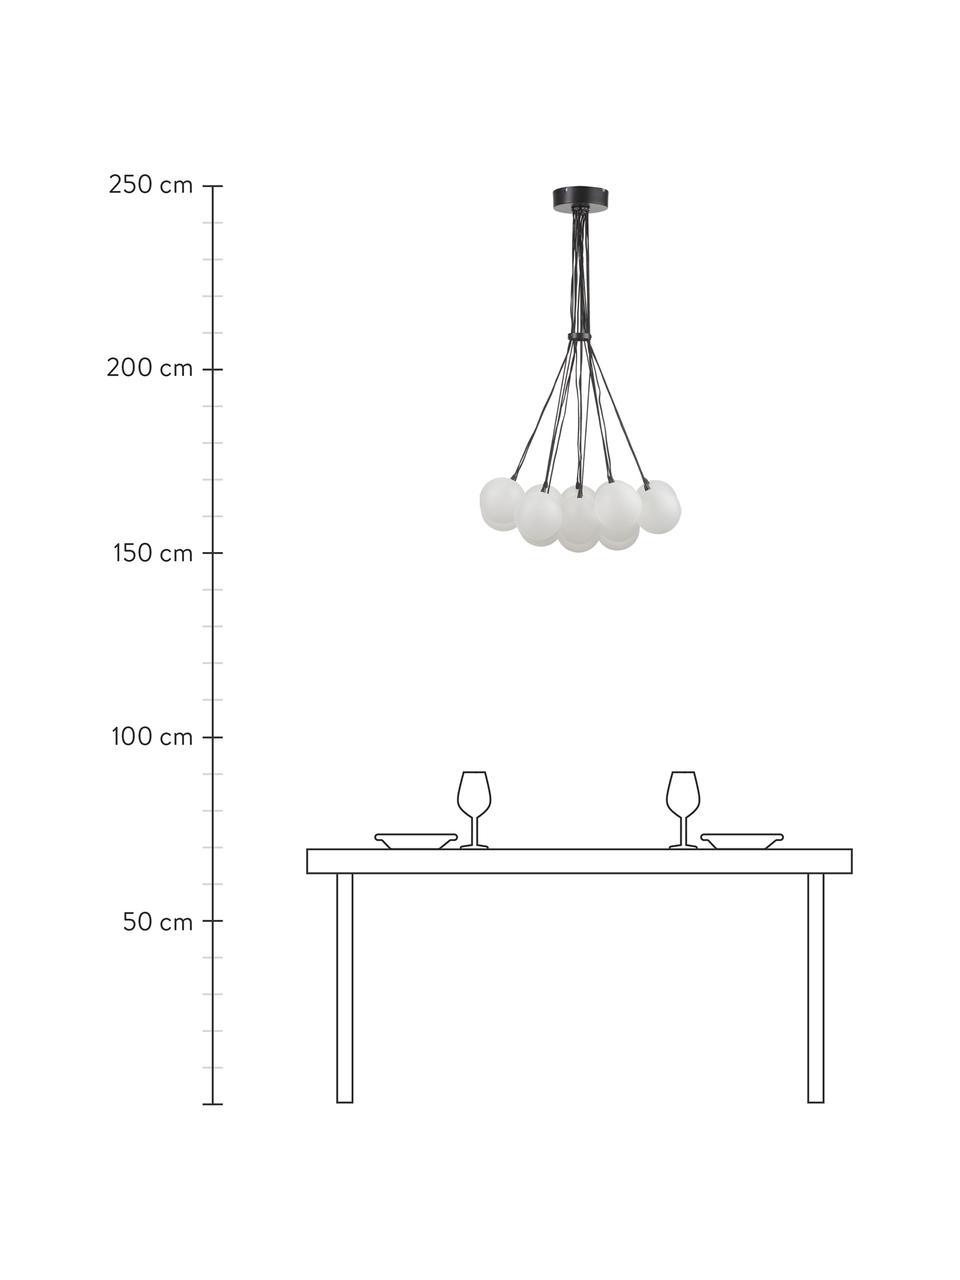 Lampada a sospensione in vetro Magda, Paralume: vetro, Baldacchino: metallo verniciato a polv, Trasparente, Ø 55 x Alt. 110 cm